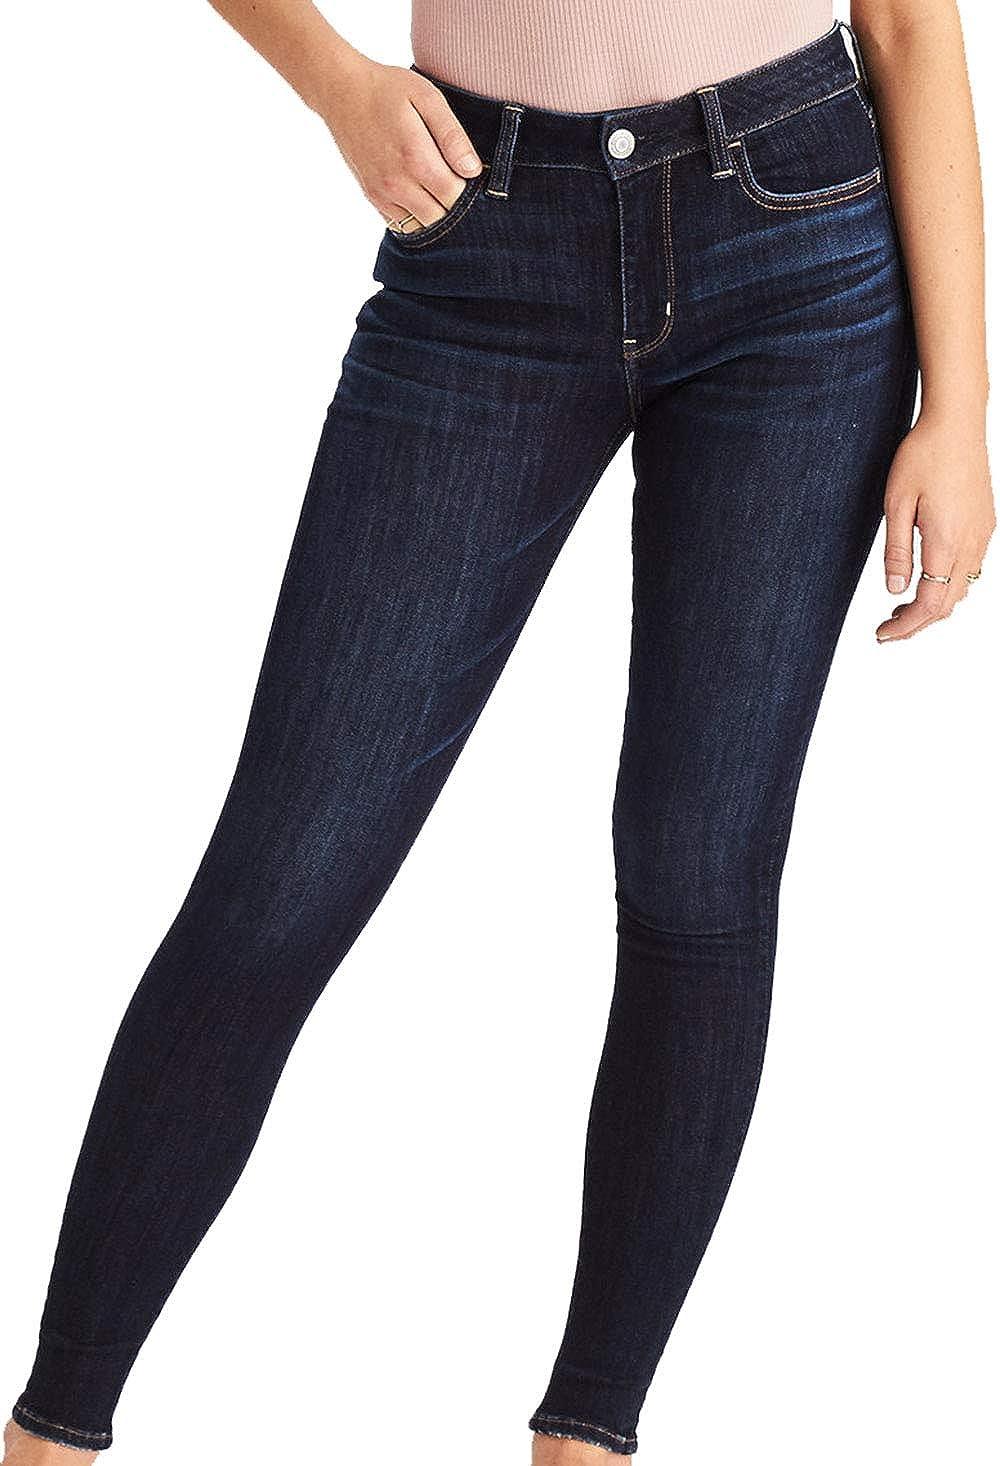 Amazon Com American Eagle Women S 04331132 Ne X T Level Stretch High Waisted Jegging Deep Sea Blue 0r Clothing